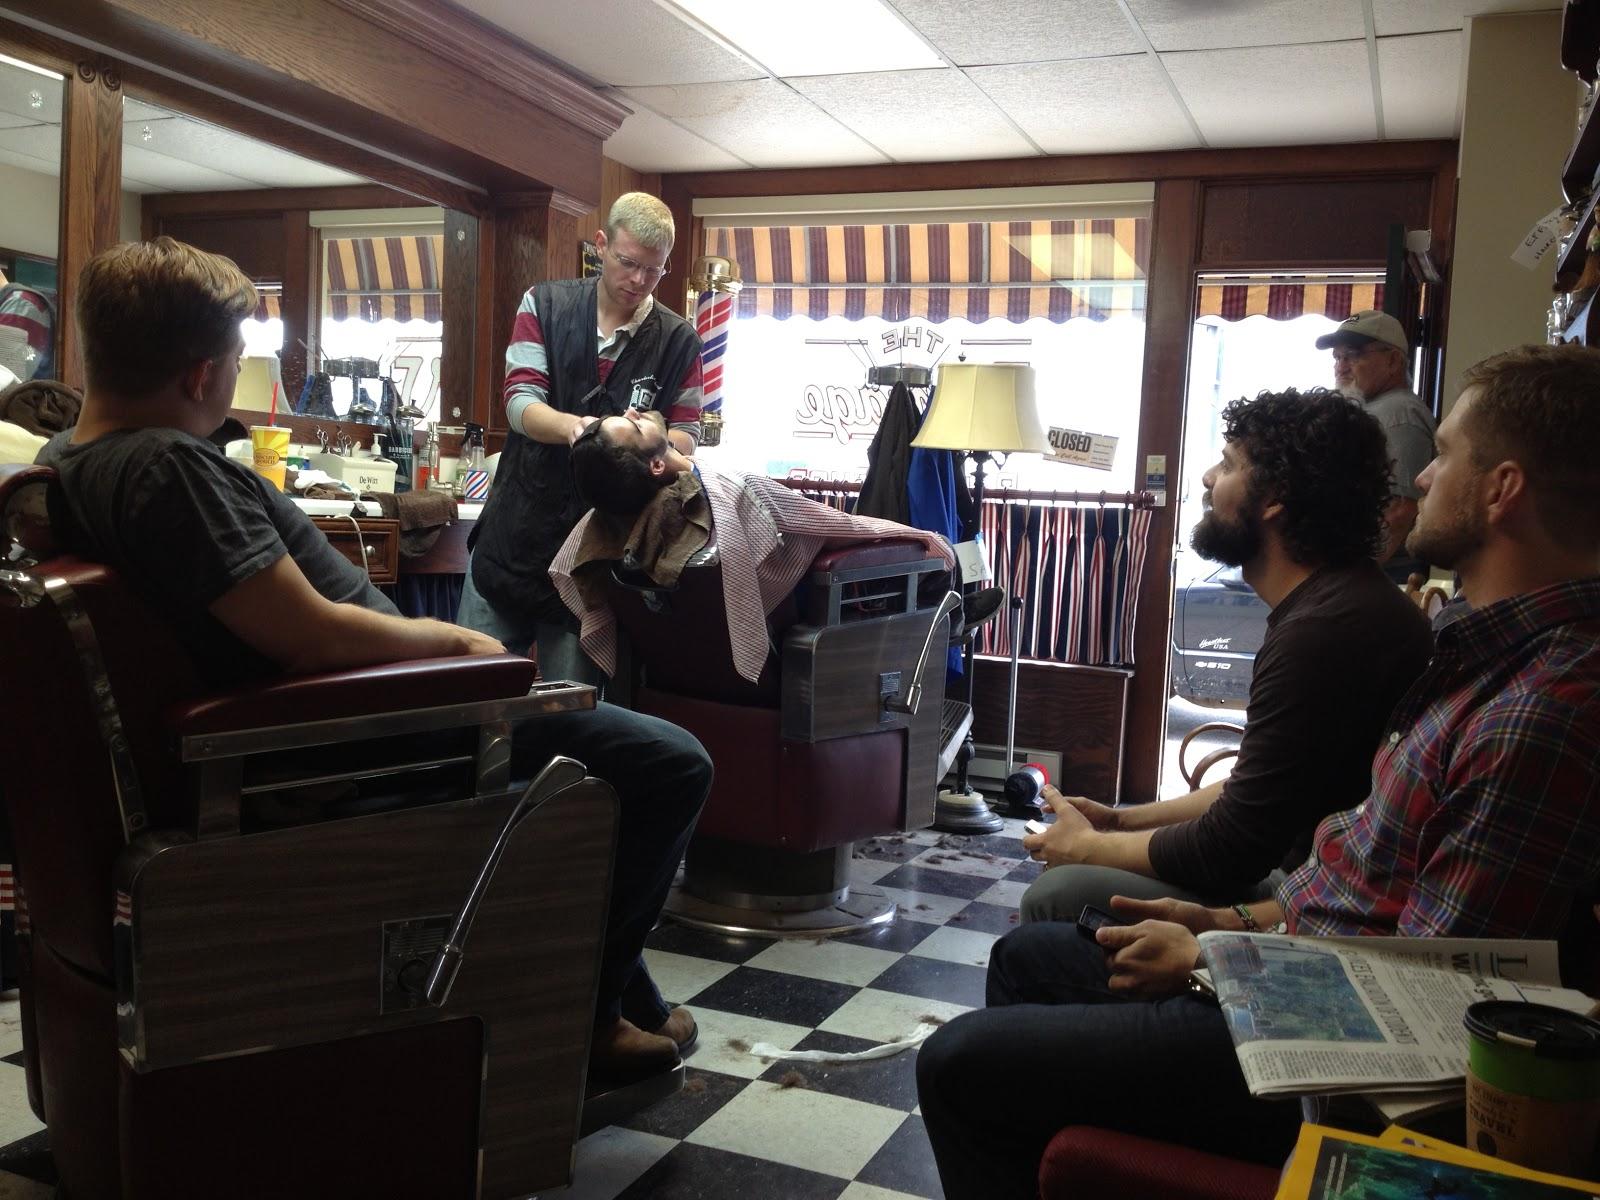 chanchanchepon: The Vintage Barber Shop